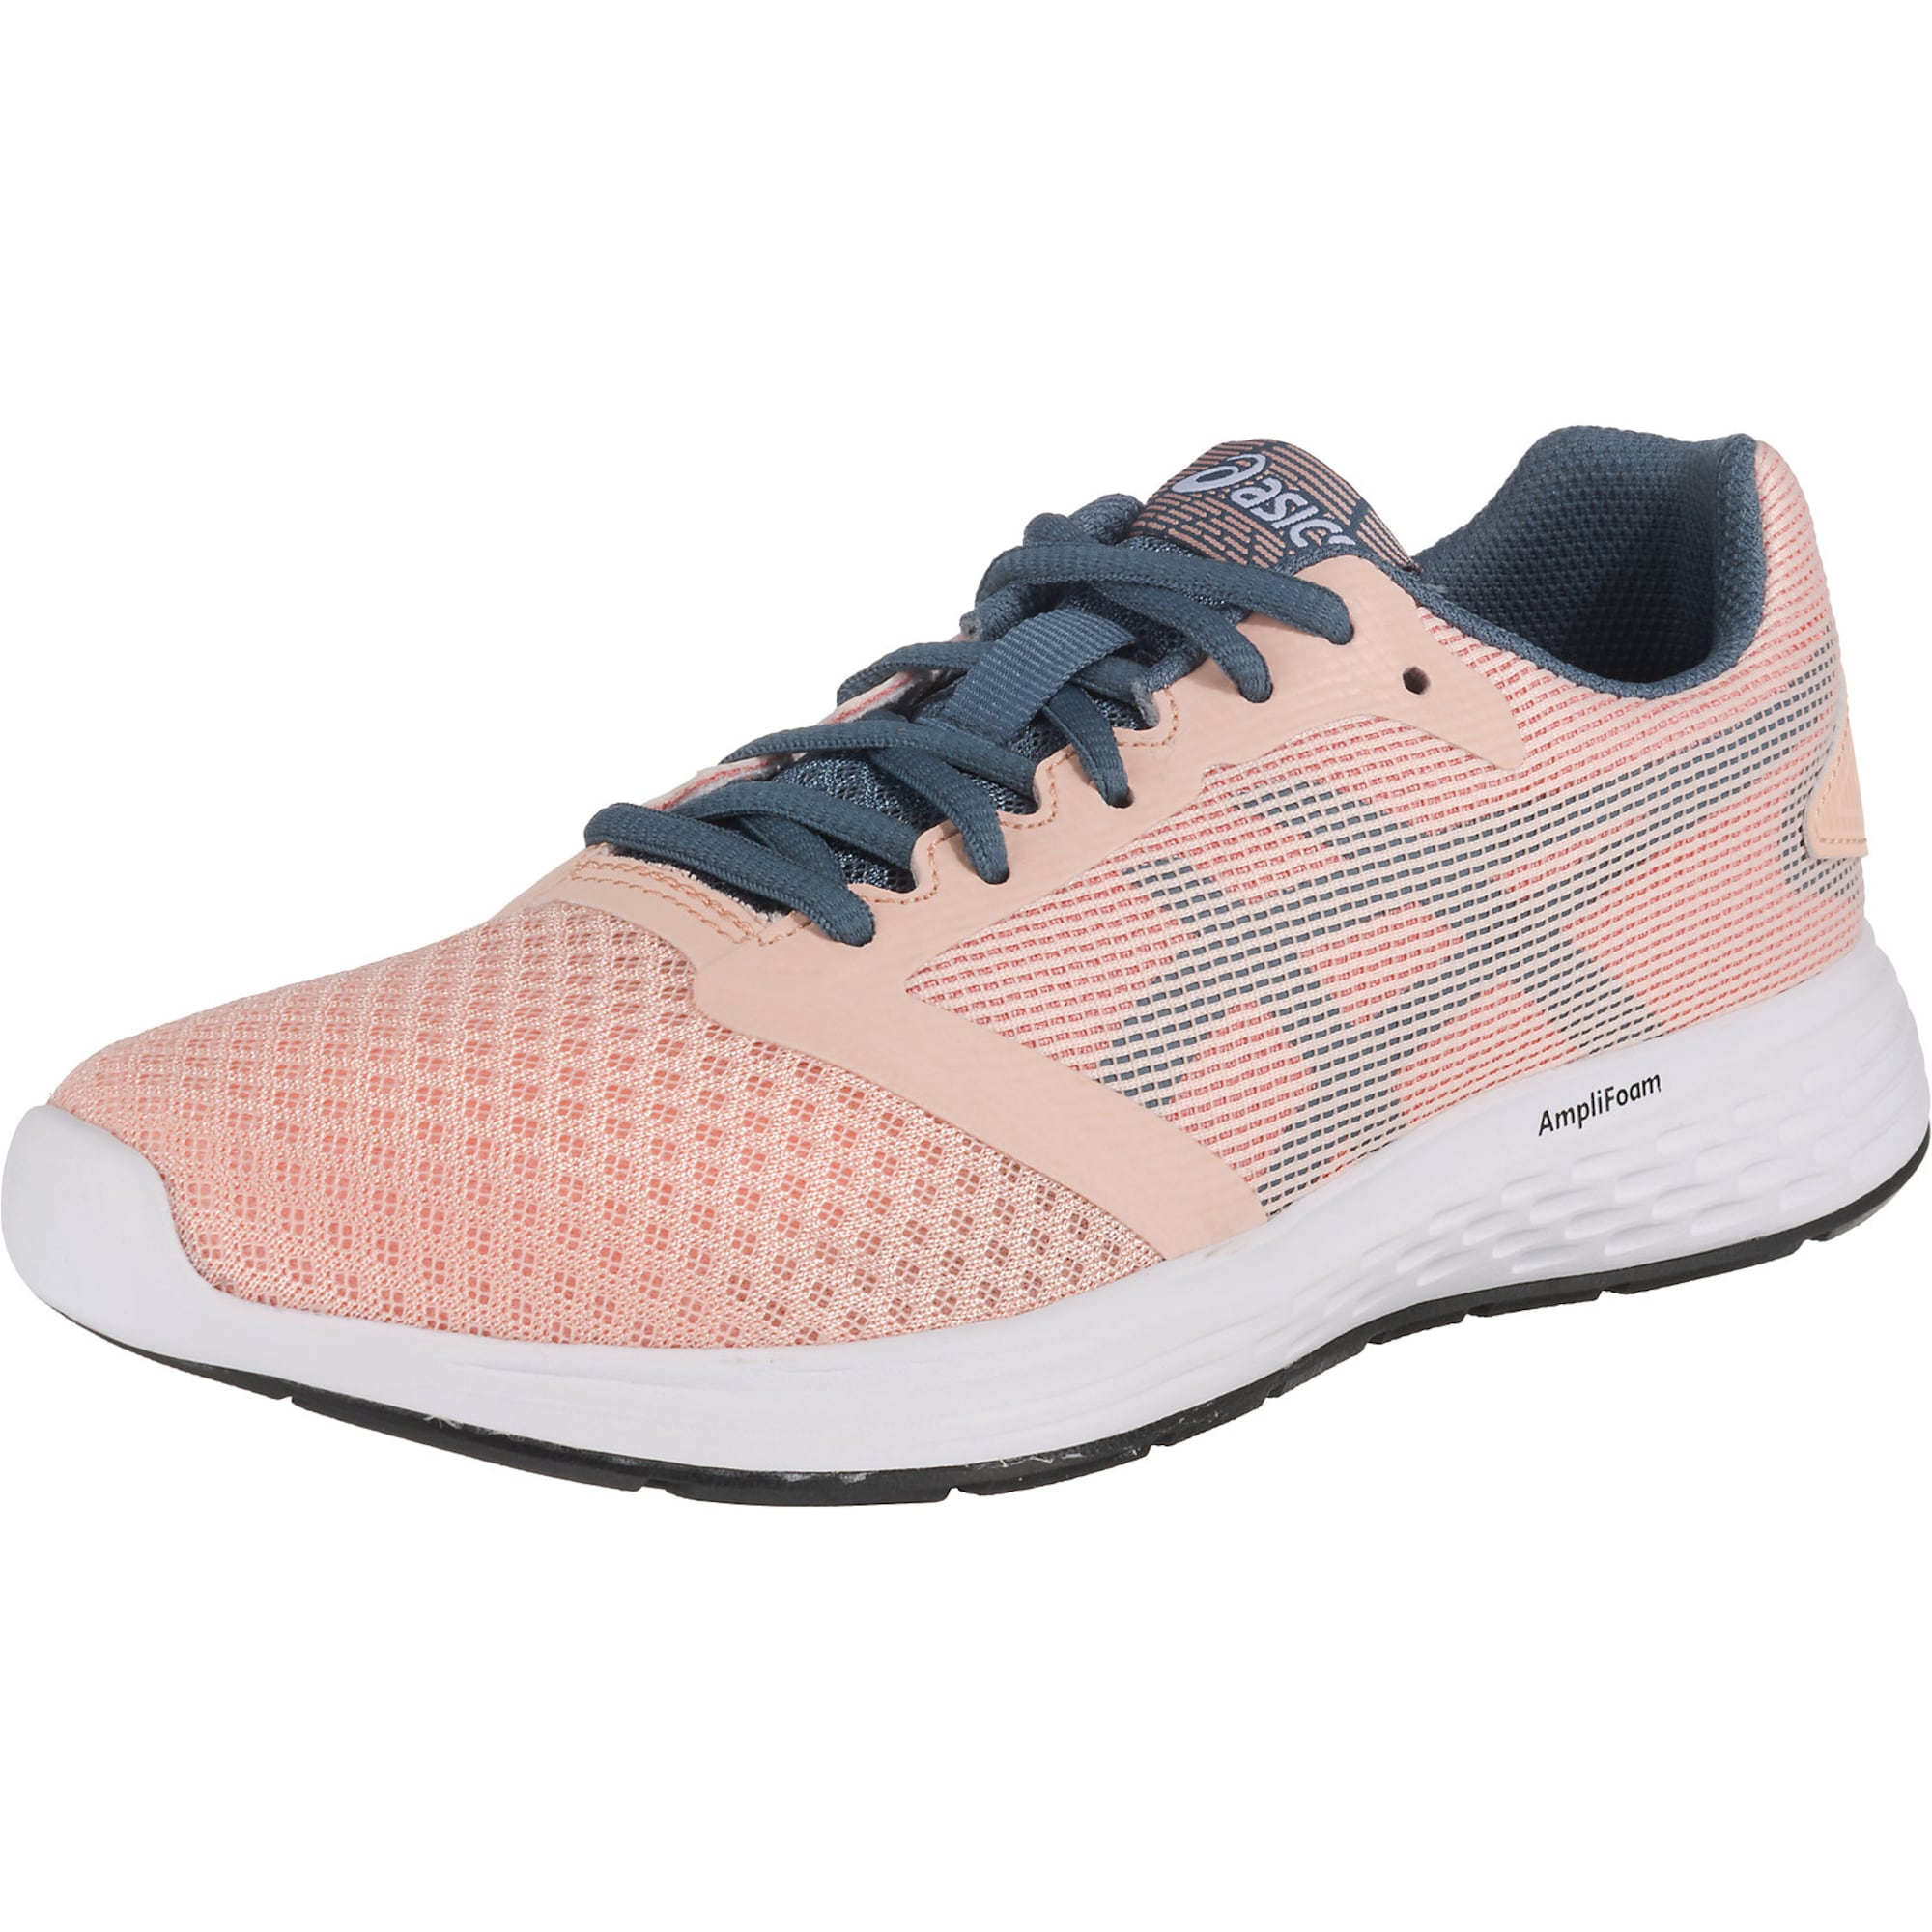 Běžecká obuv Patriot 10 chladná modrá růžová bílá ASICS